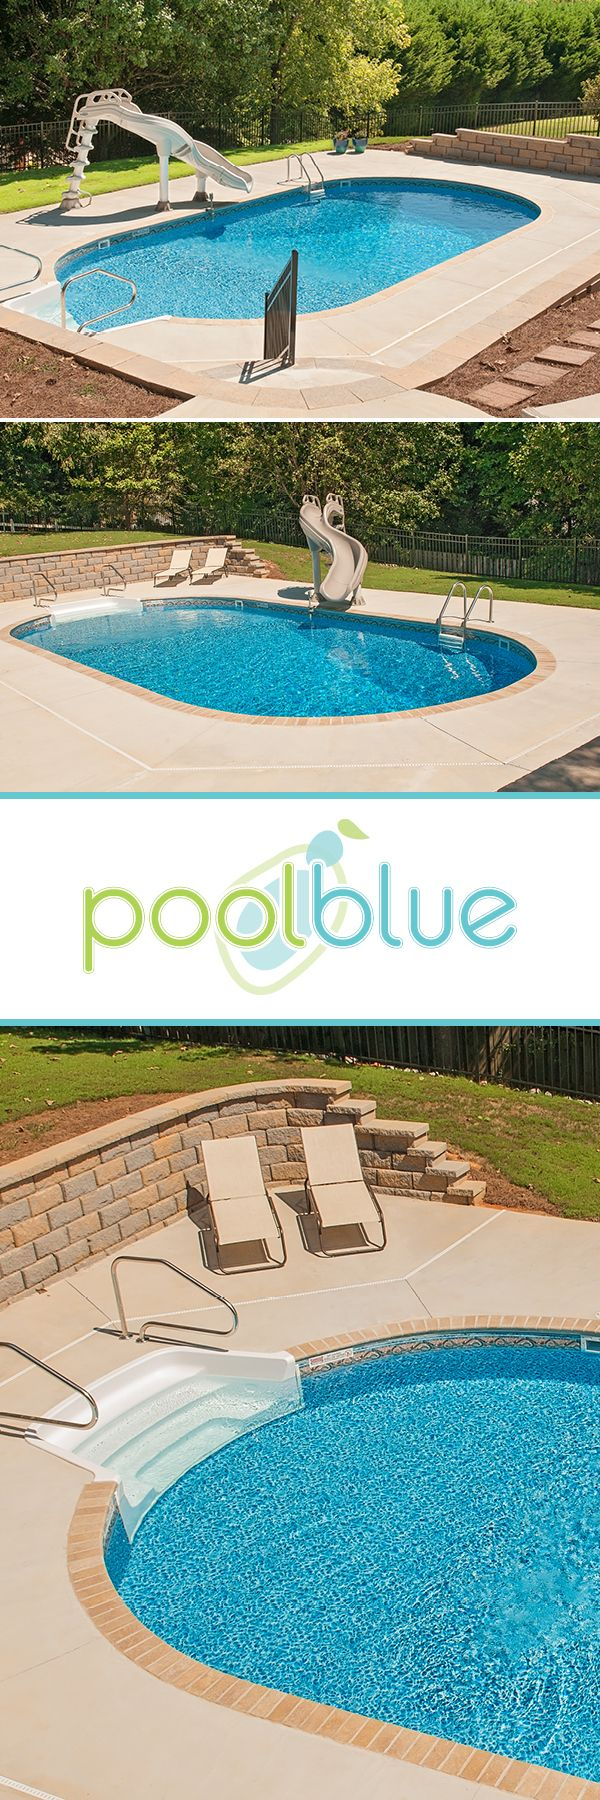 57 best pools images on pinterest backyard ideas swimming pools